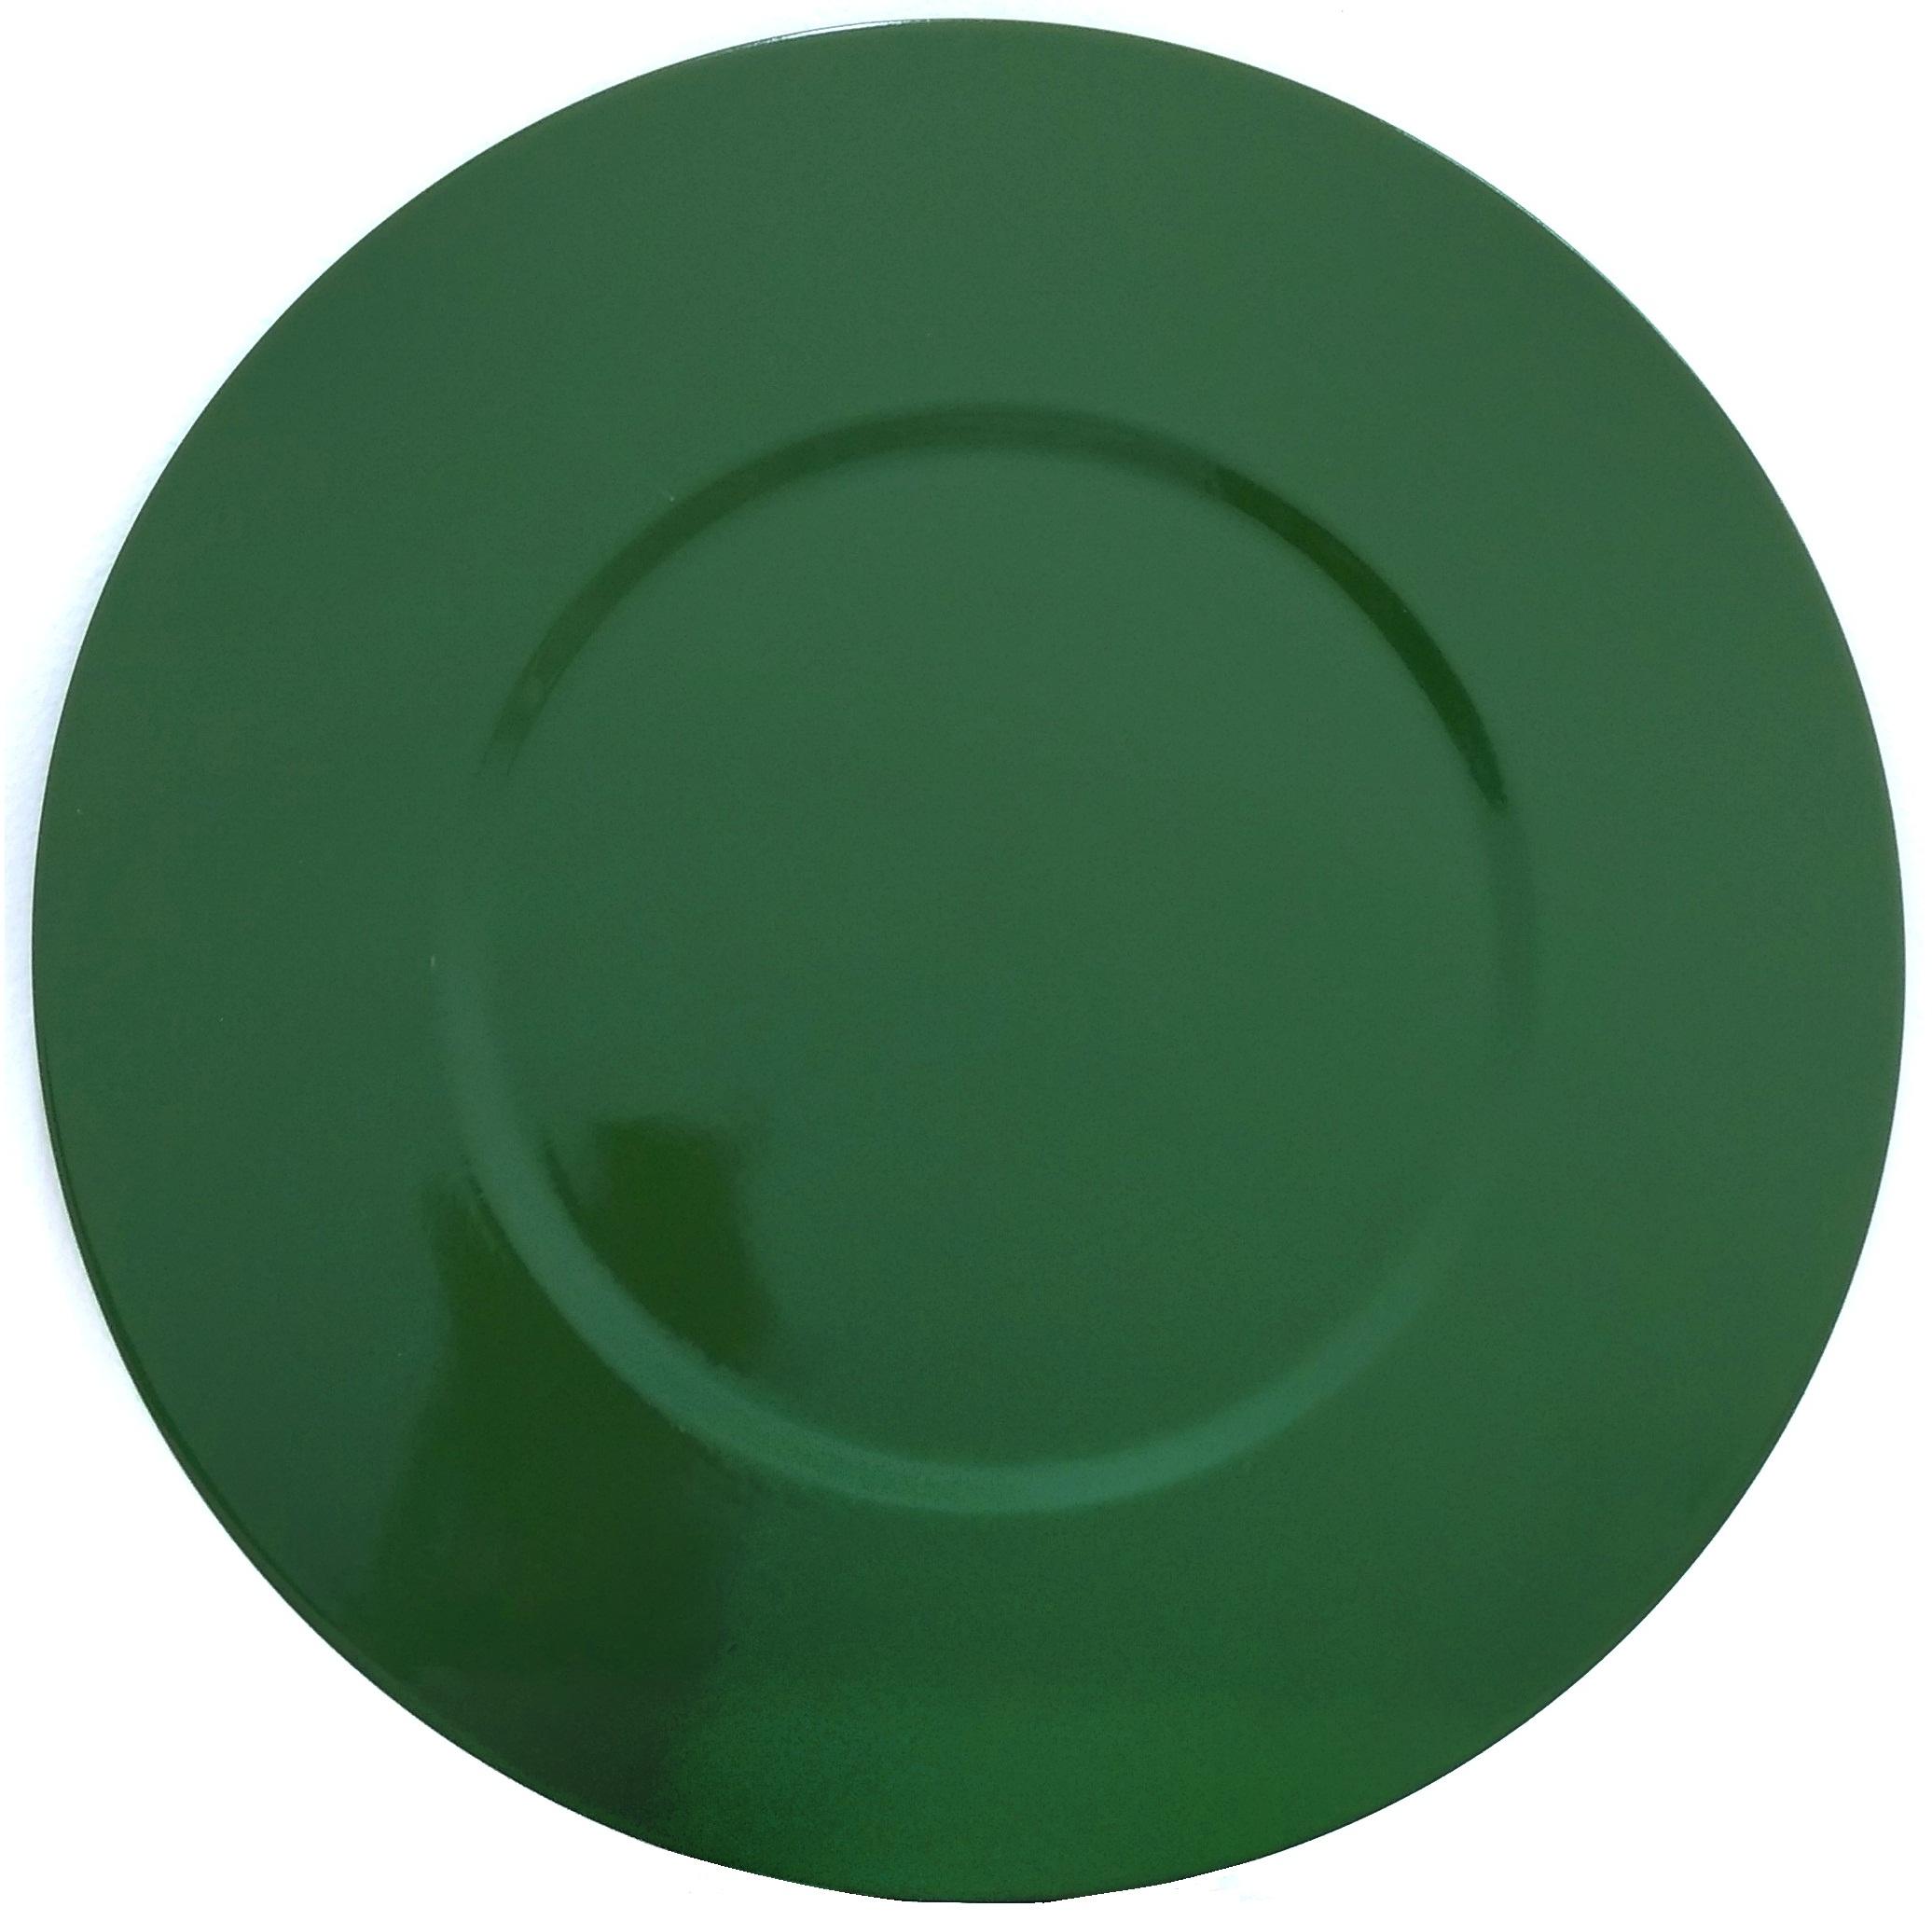 Verde Military Aluguel de sousplat